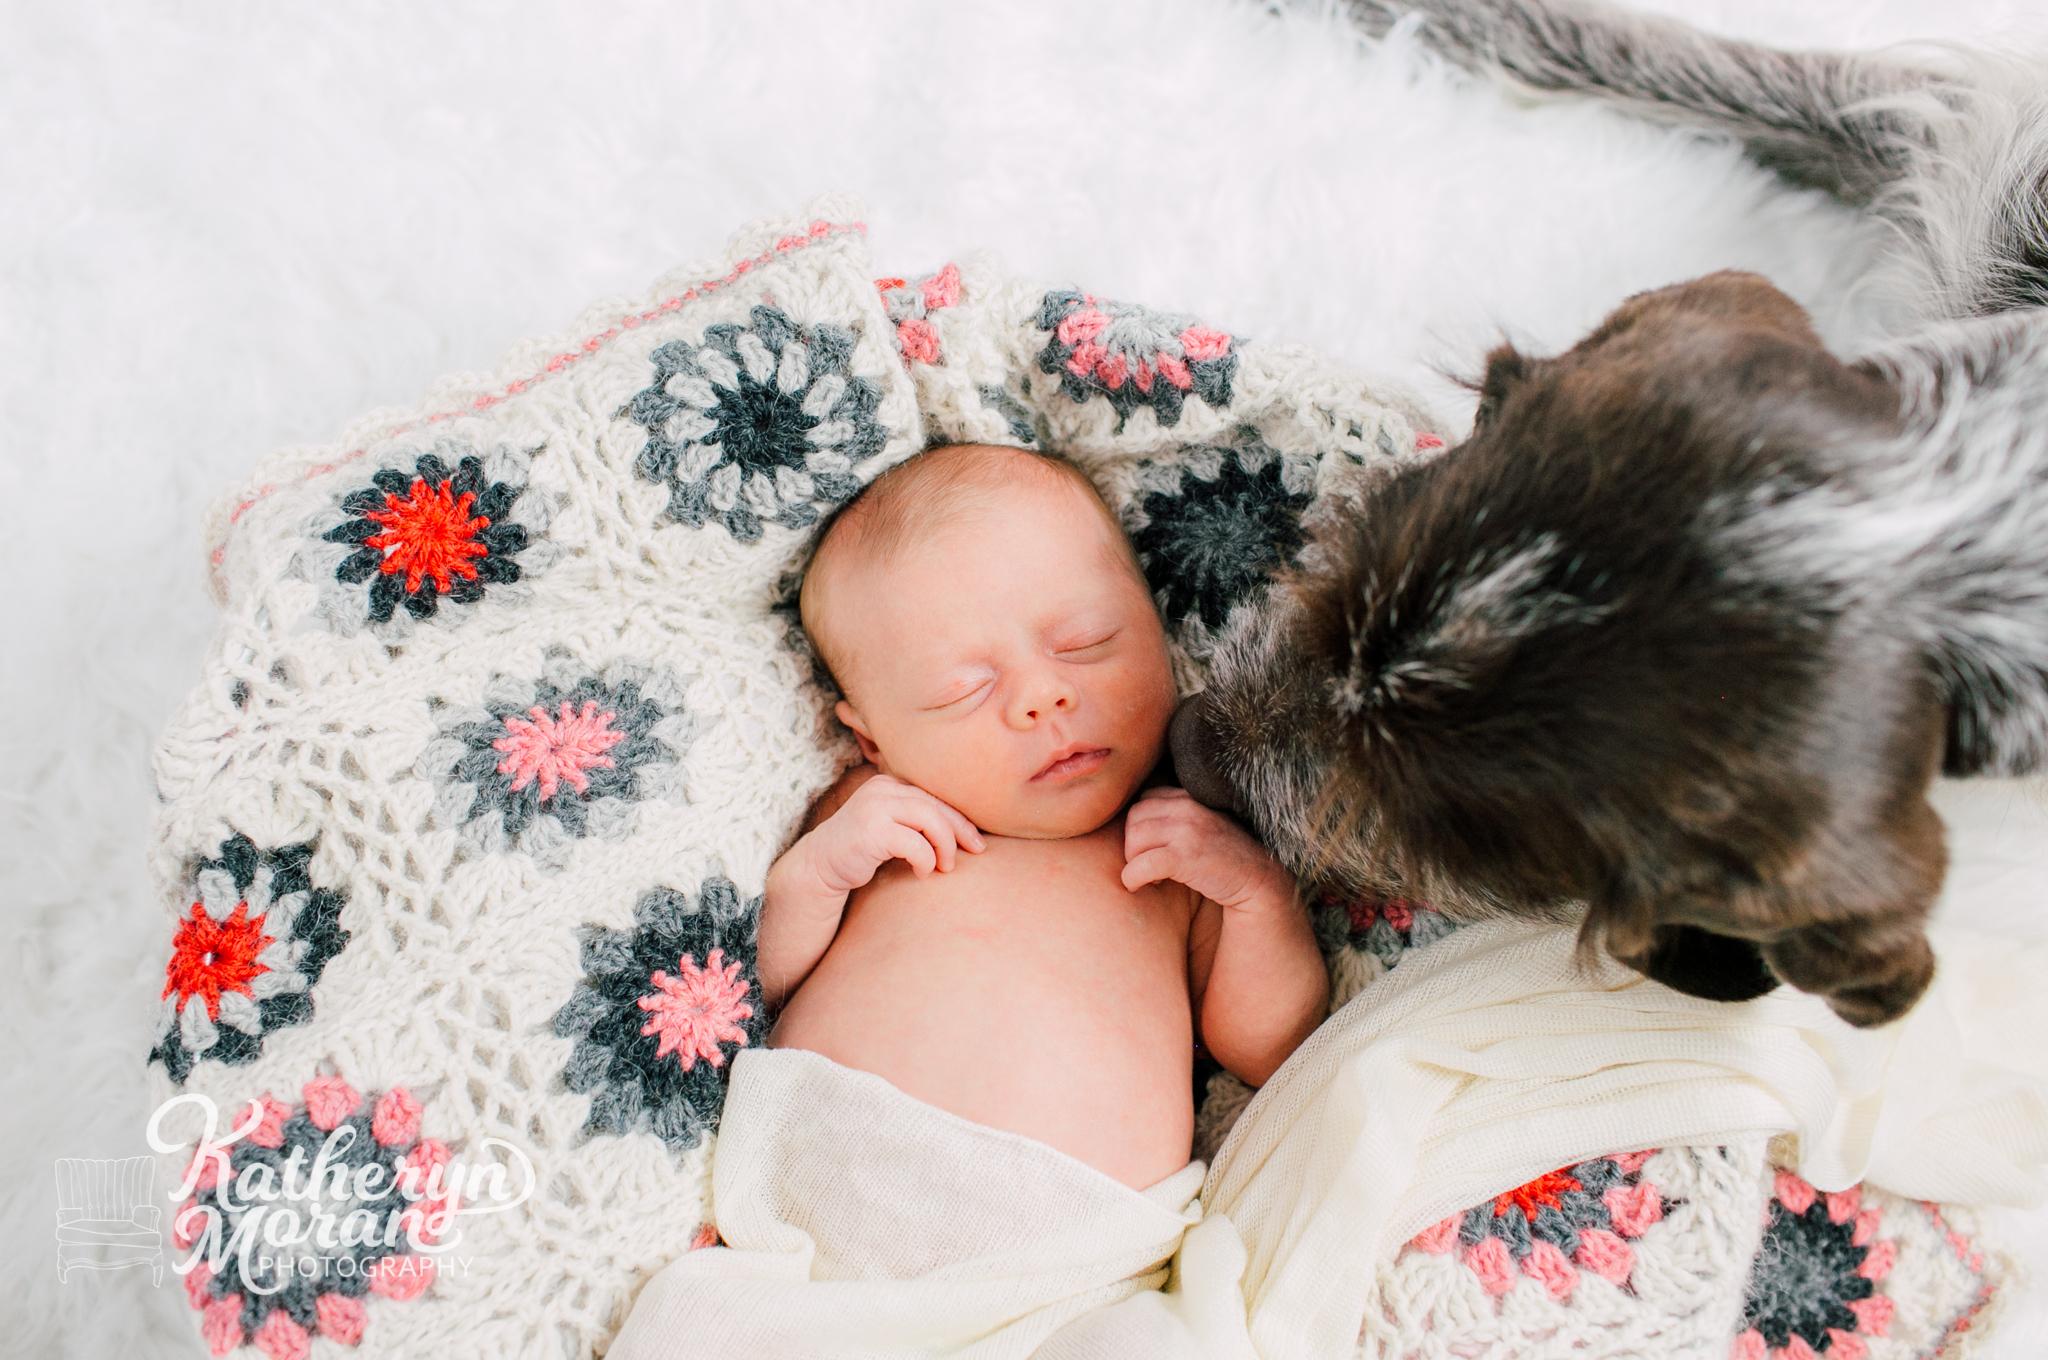 seattle-newborn-photographer-katheryn-moran-avery-malaspino-4.jpg